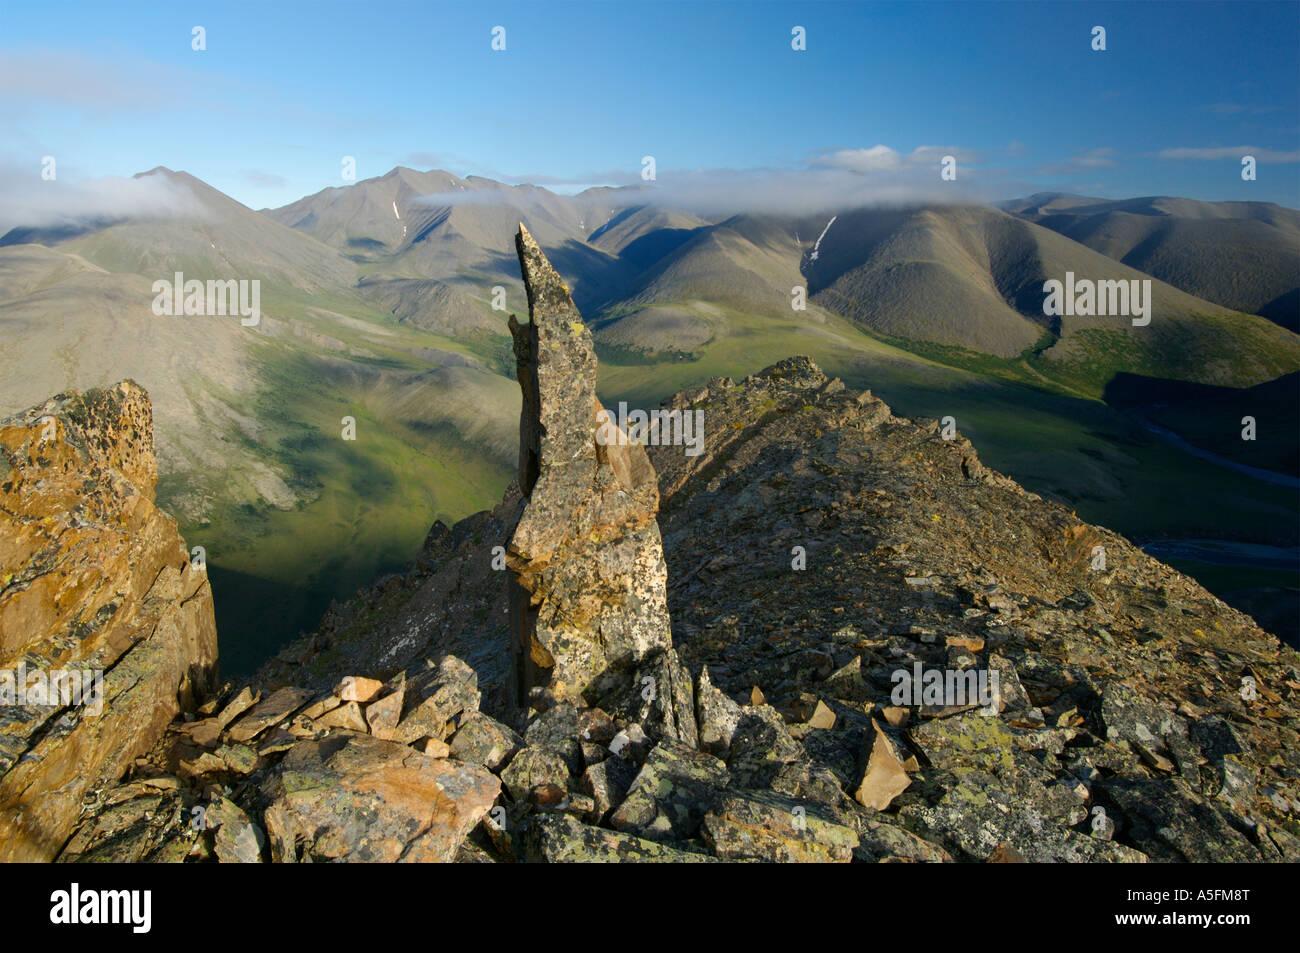 ivvavik national park canada - photo #22